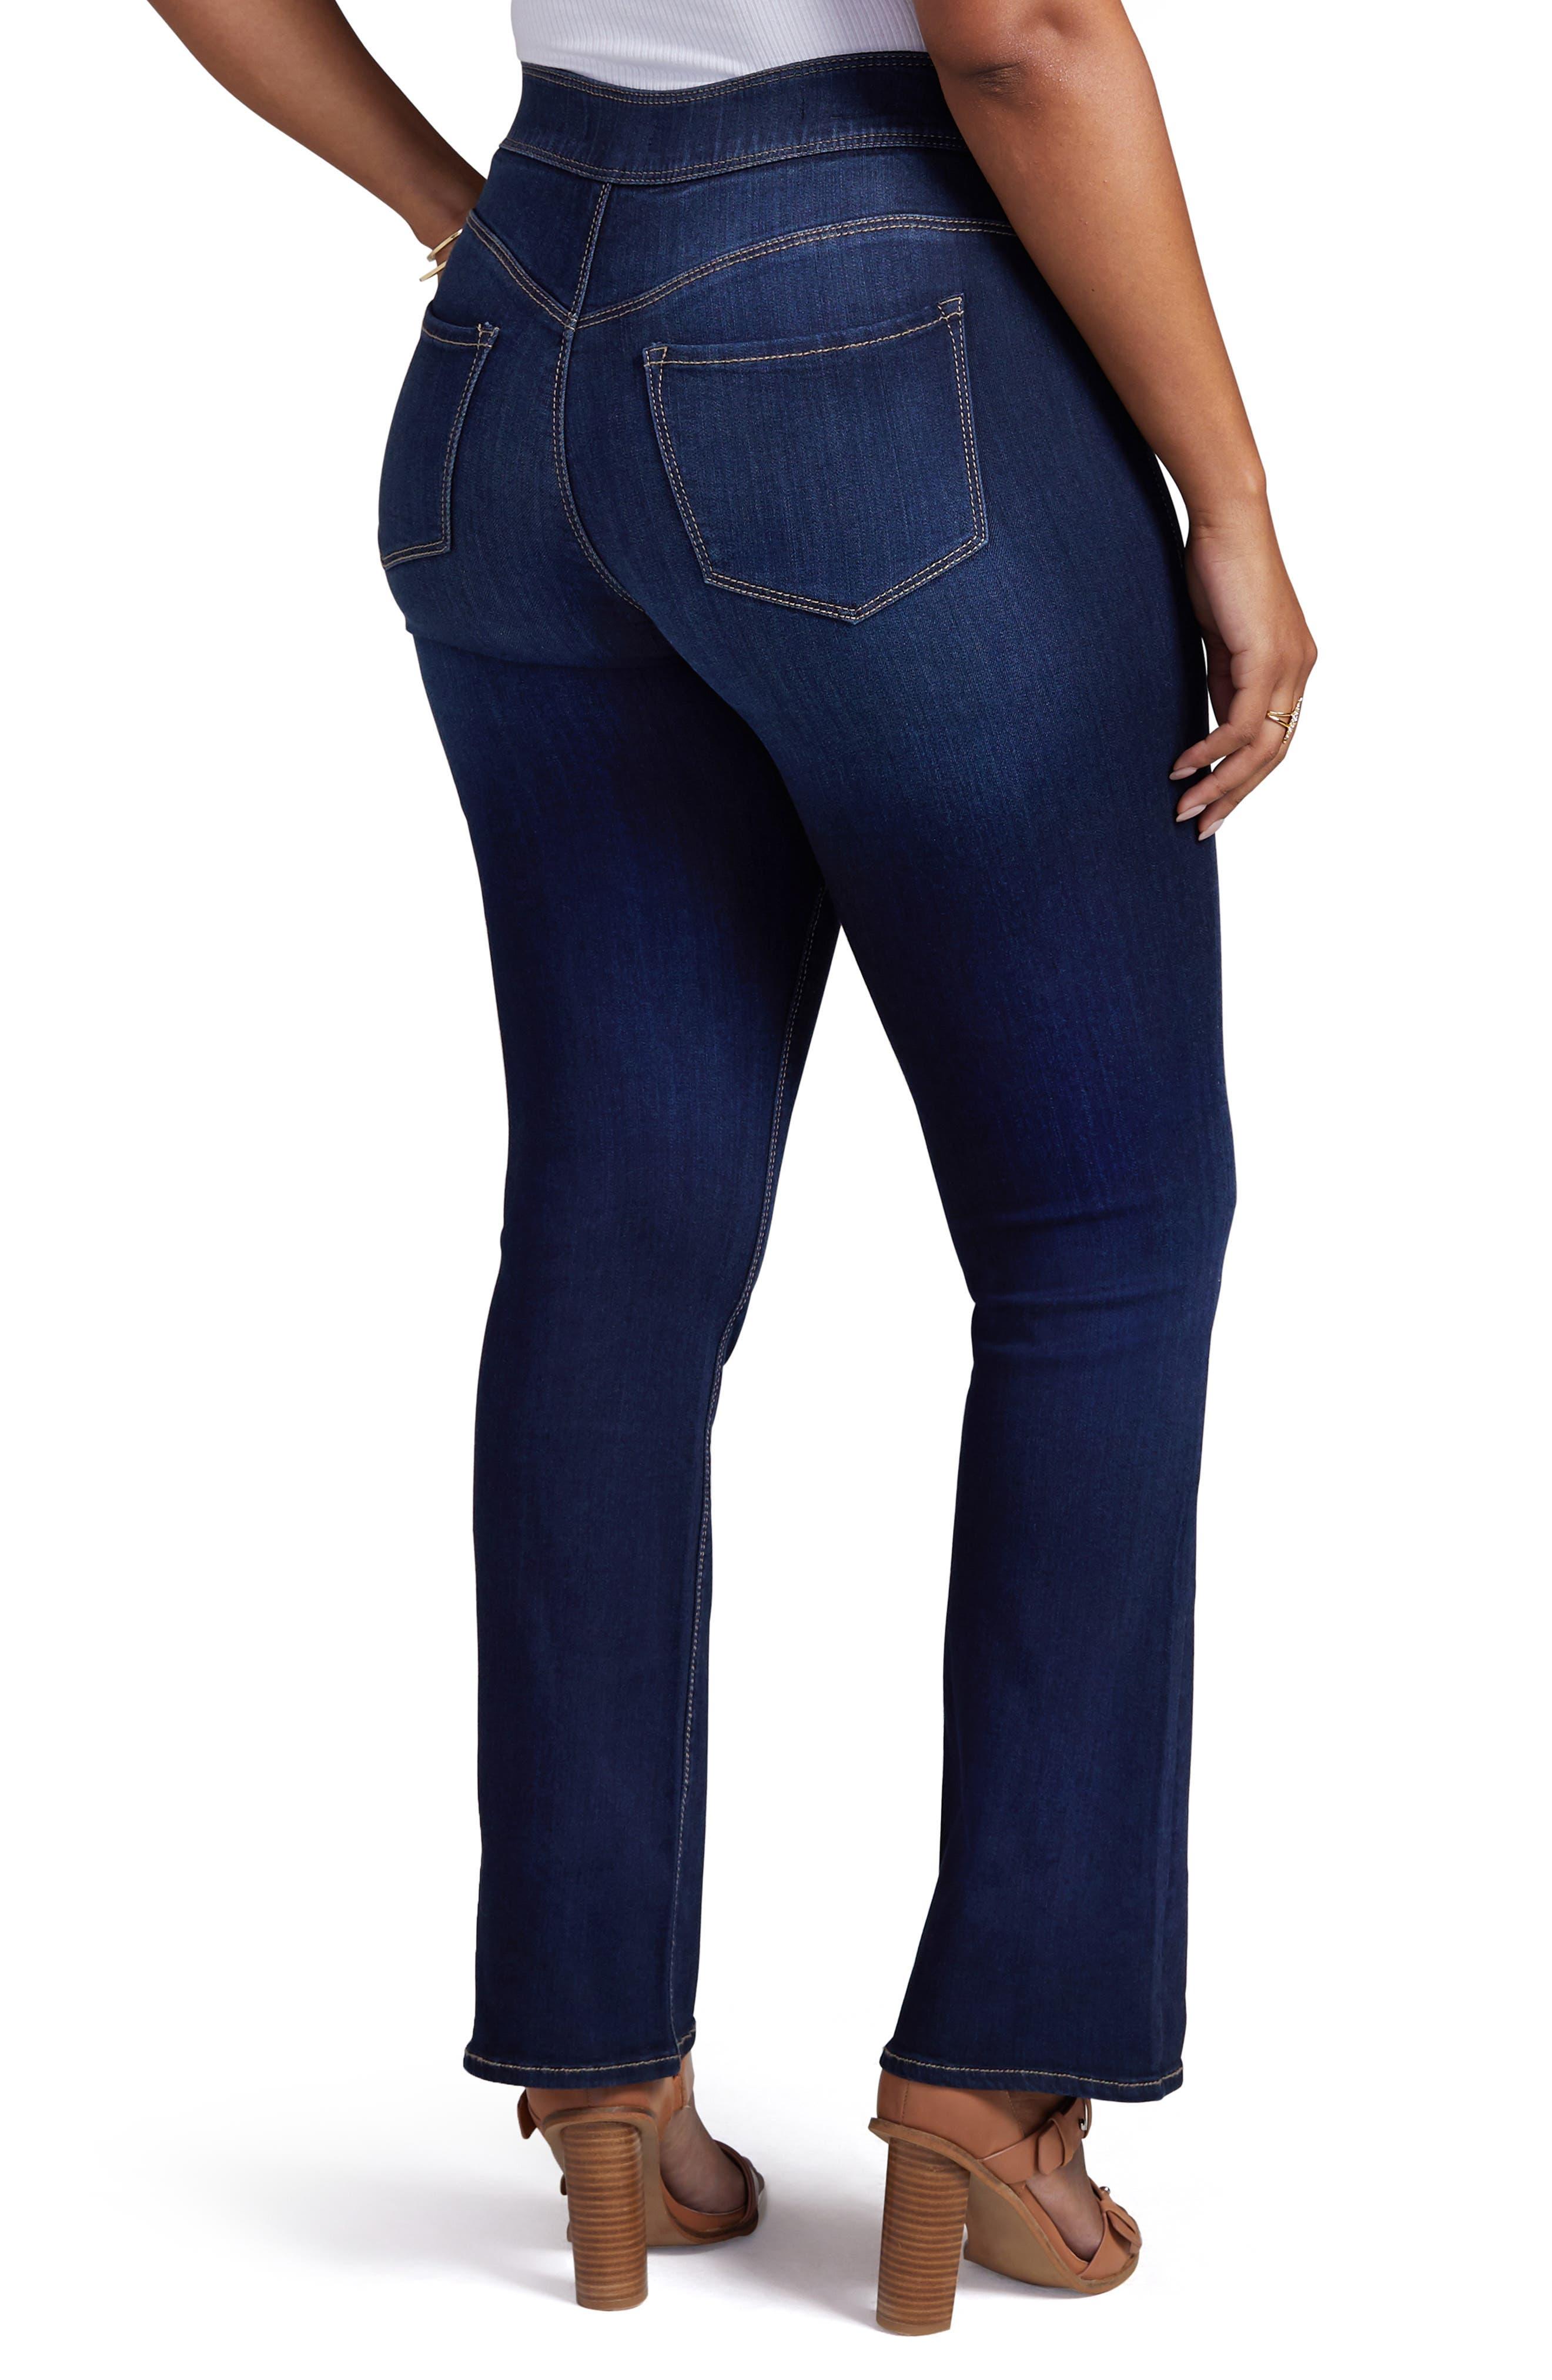 Pull-On Skinny Bootcut Jeans,                             Alternate thumbnail 2, color,                             VENUS